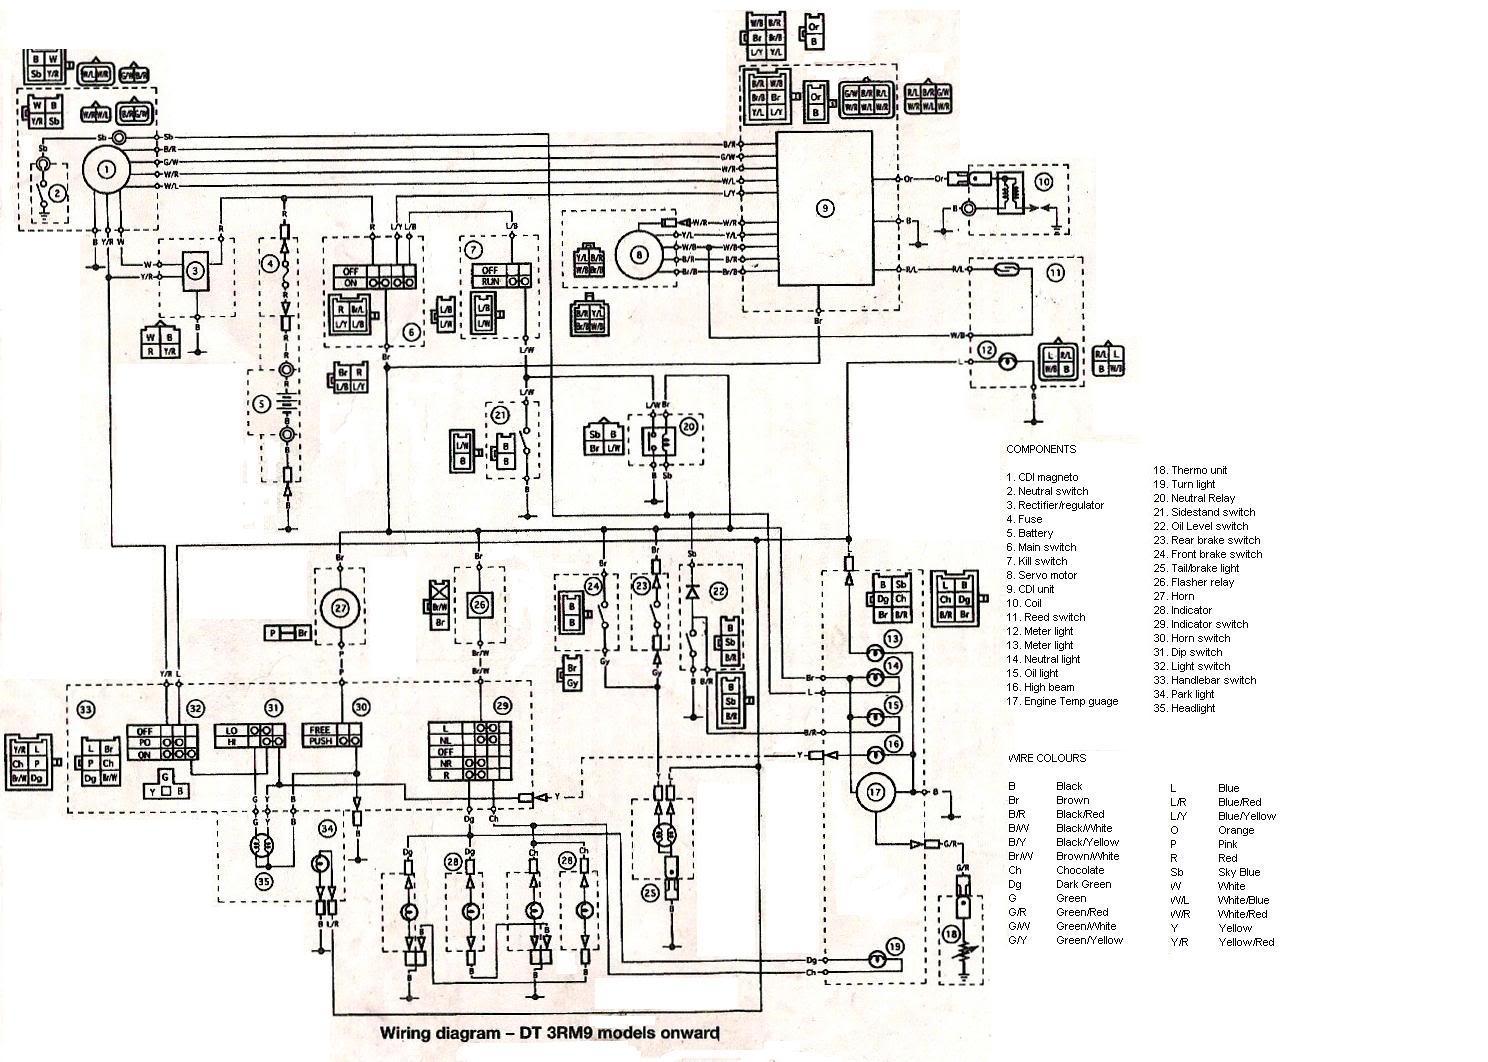 [DR_5391] Yfz350 Wiring Diagram Cdi Schematic Wiring